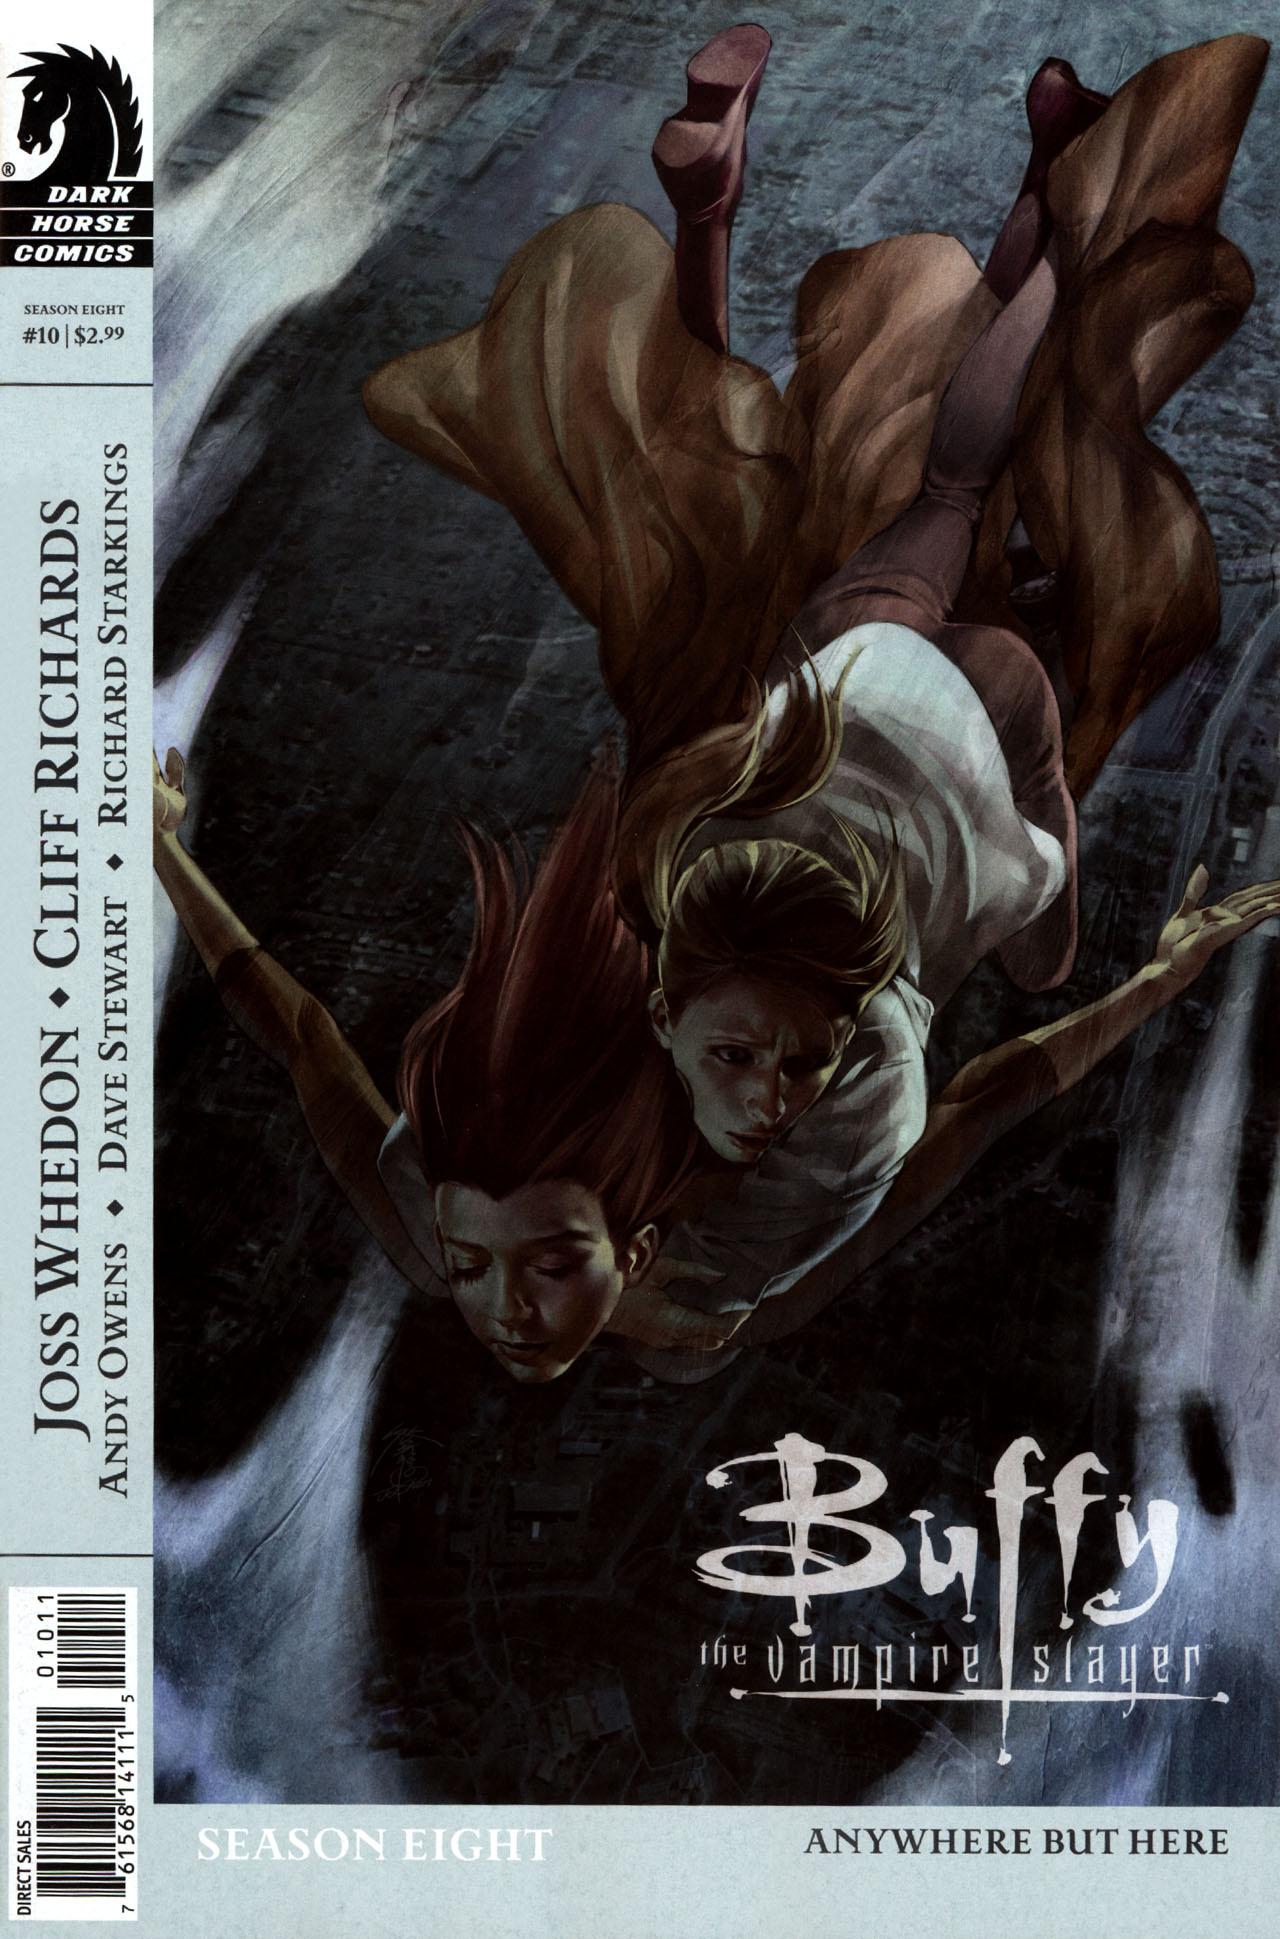 Buffy the Vampire Slayer Season Eight 10 Page 1